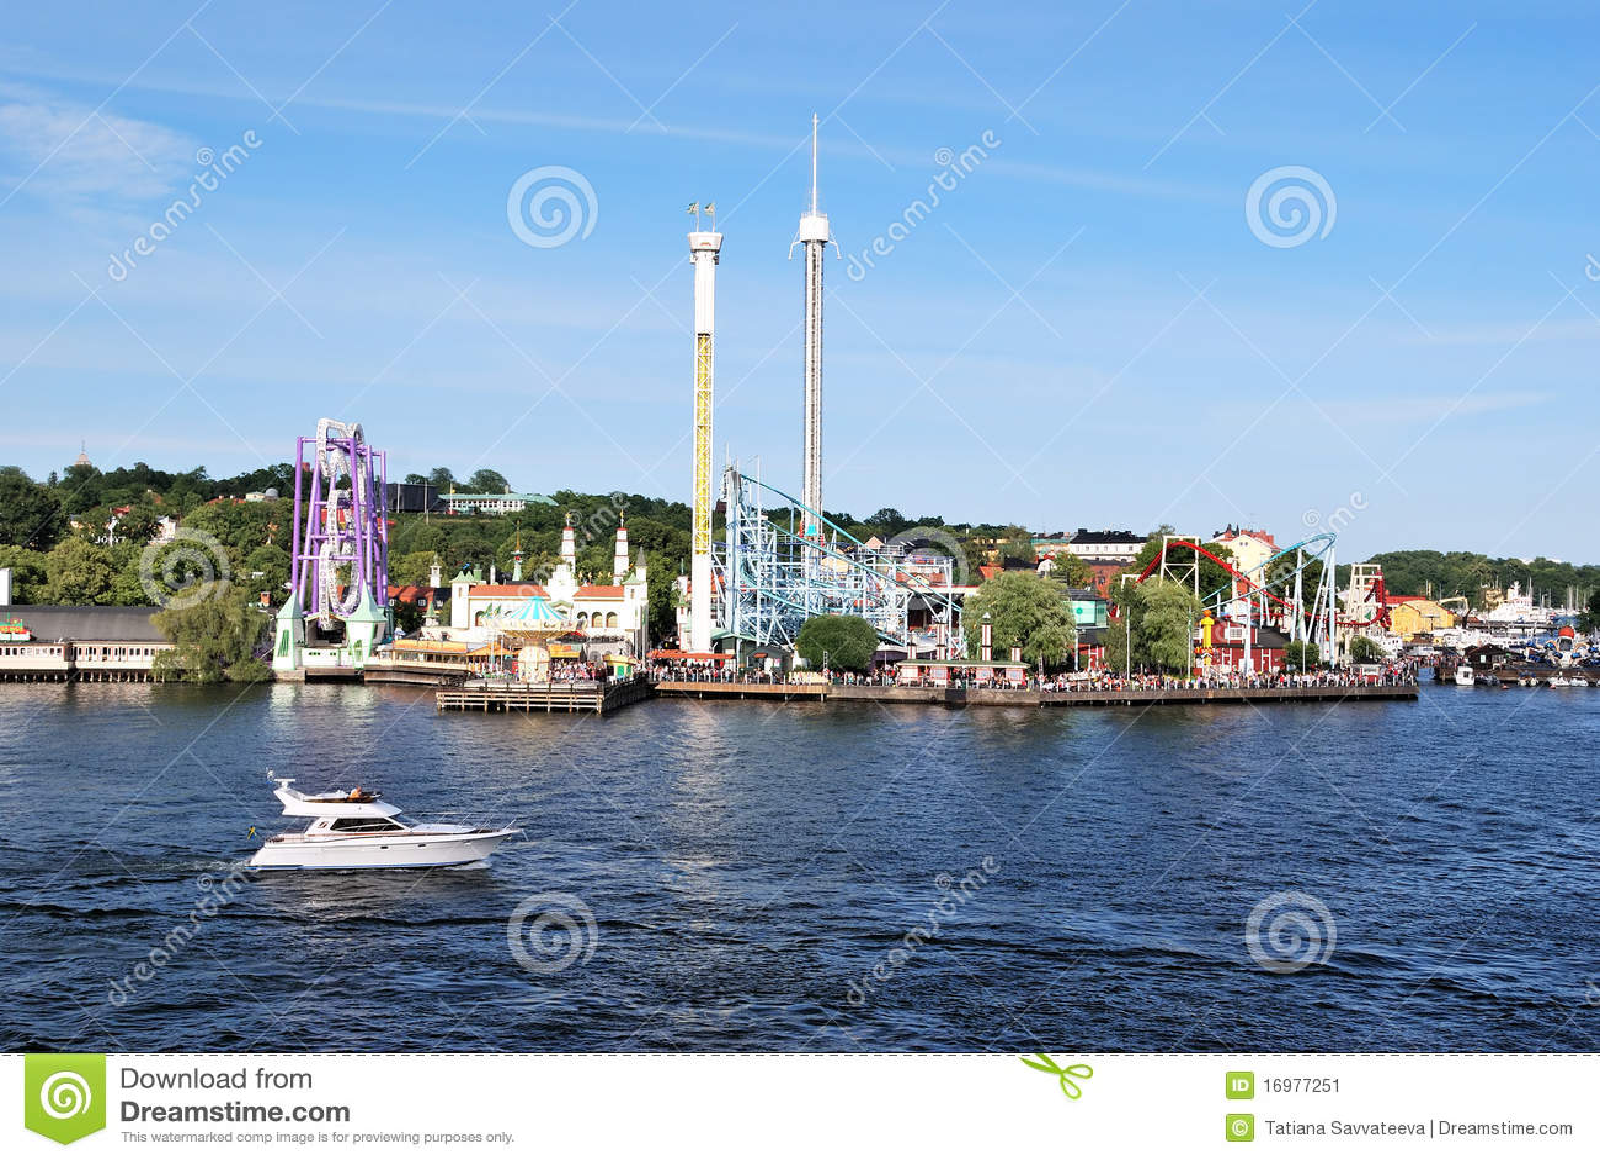 Stockholm. Park Grona Lund